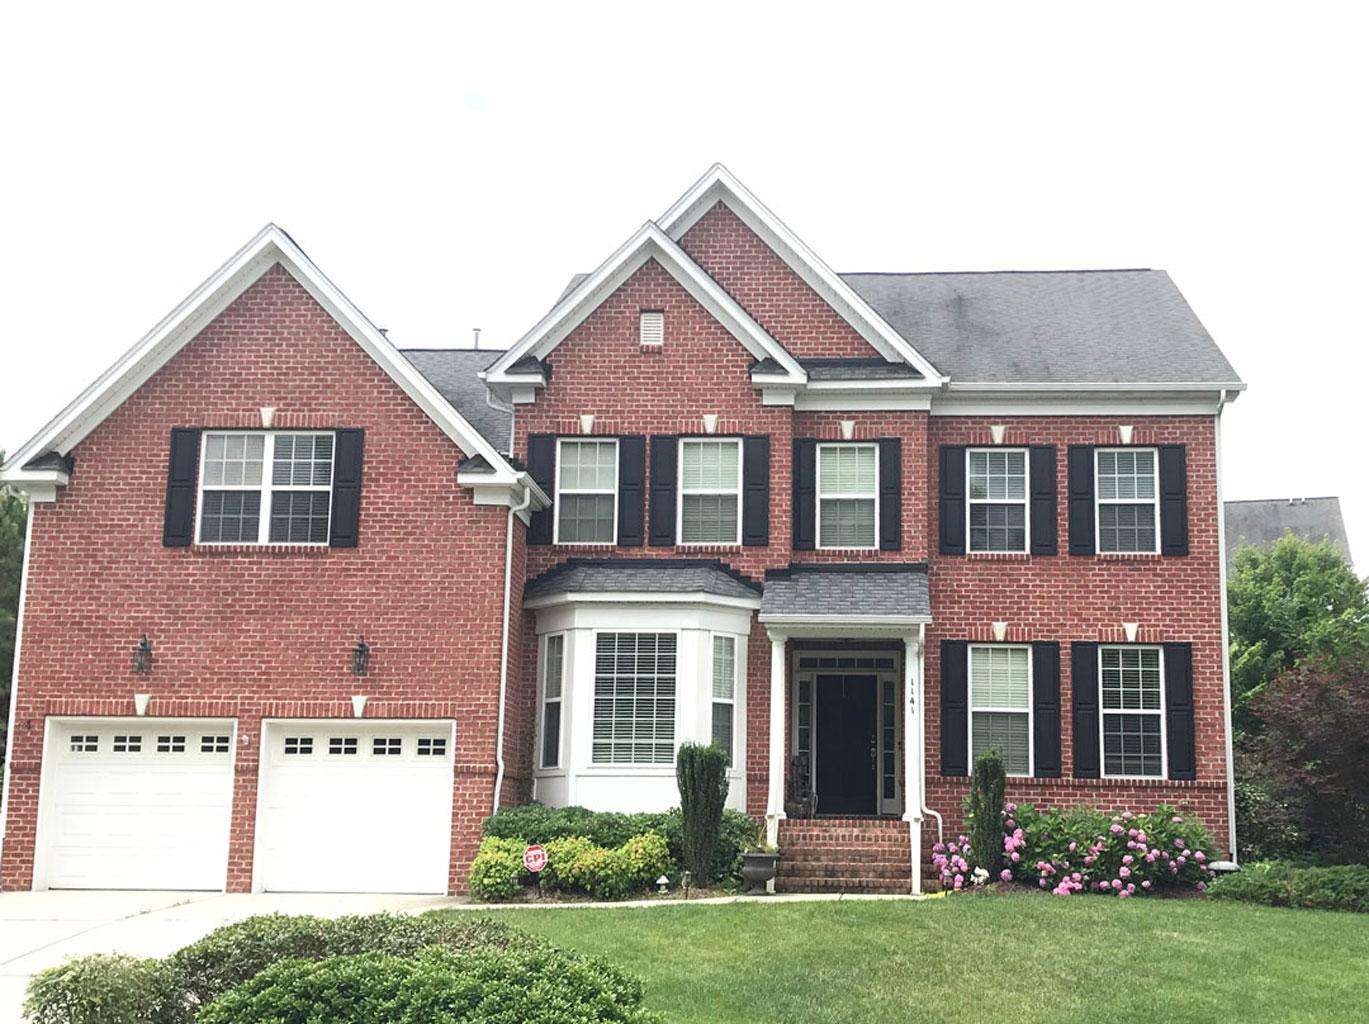 House in Weldon Ridge Cary NC